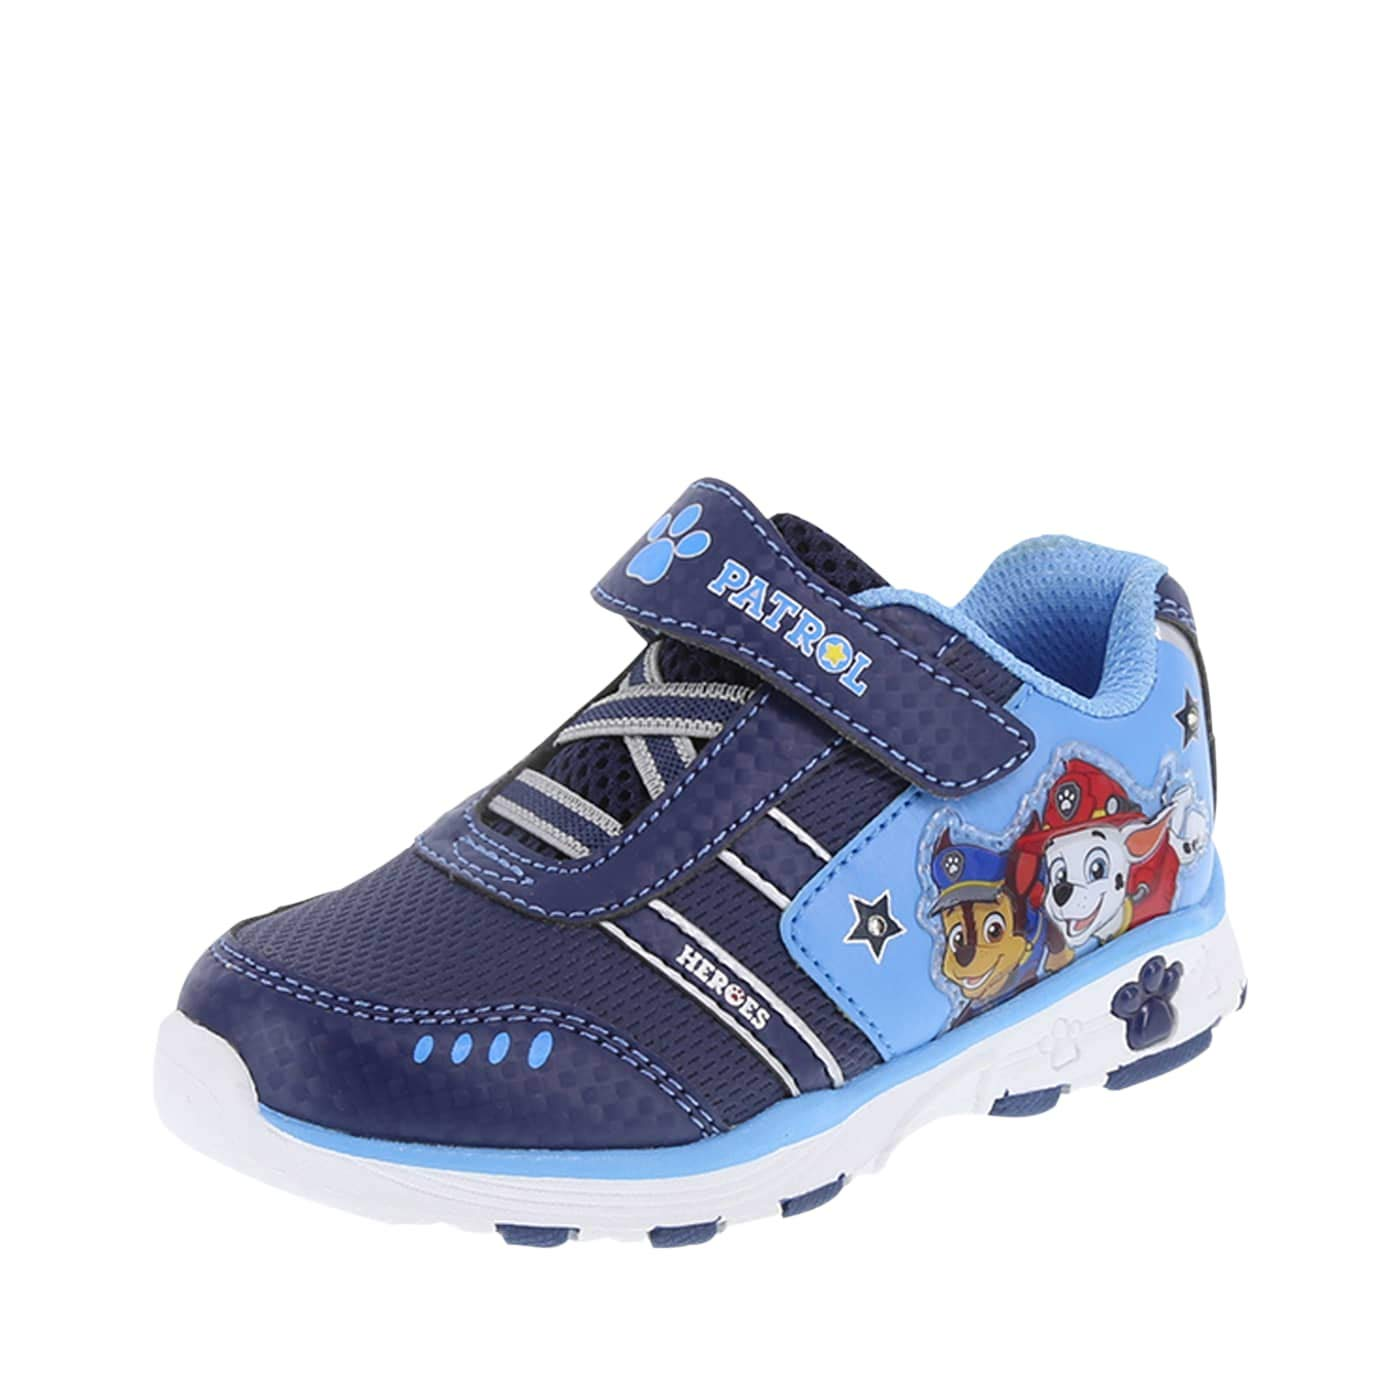 Paw Patrol Nickelodeon Boys Toddler Lighted Runner 079422-Parent